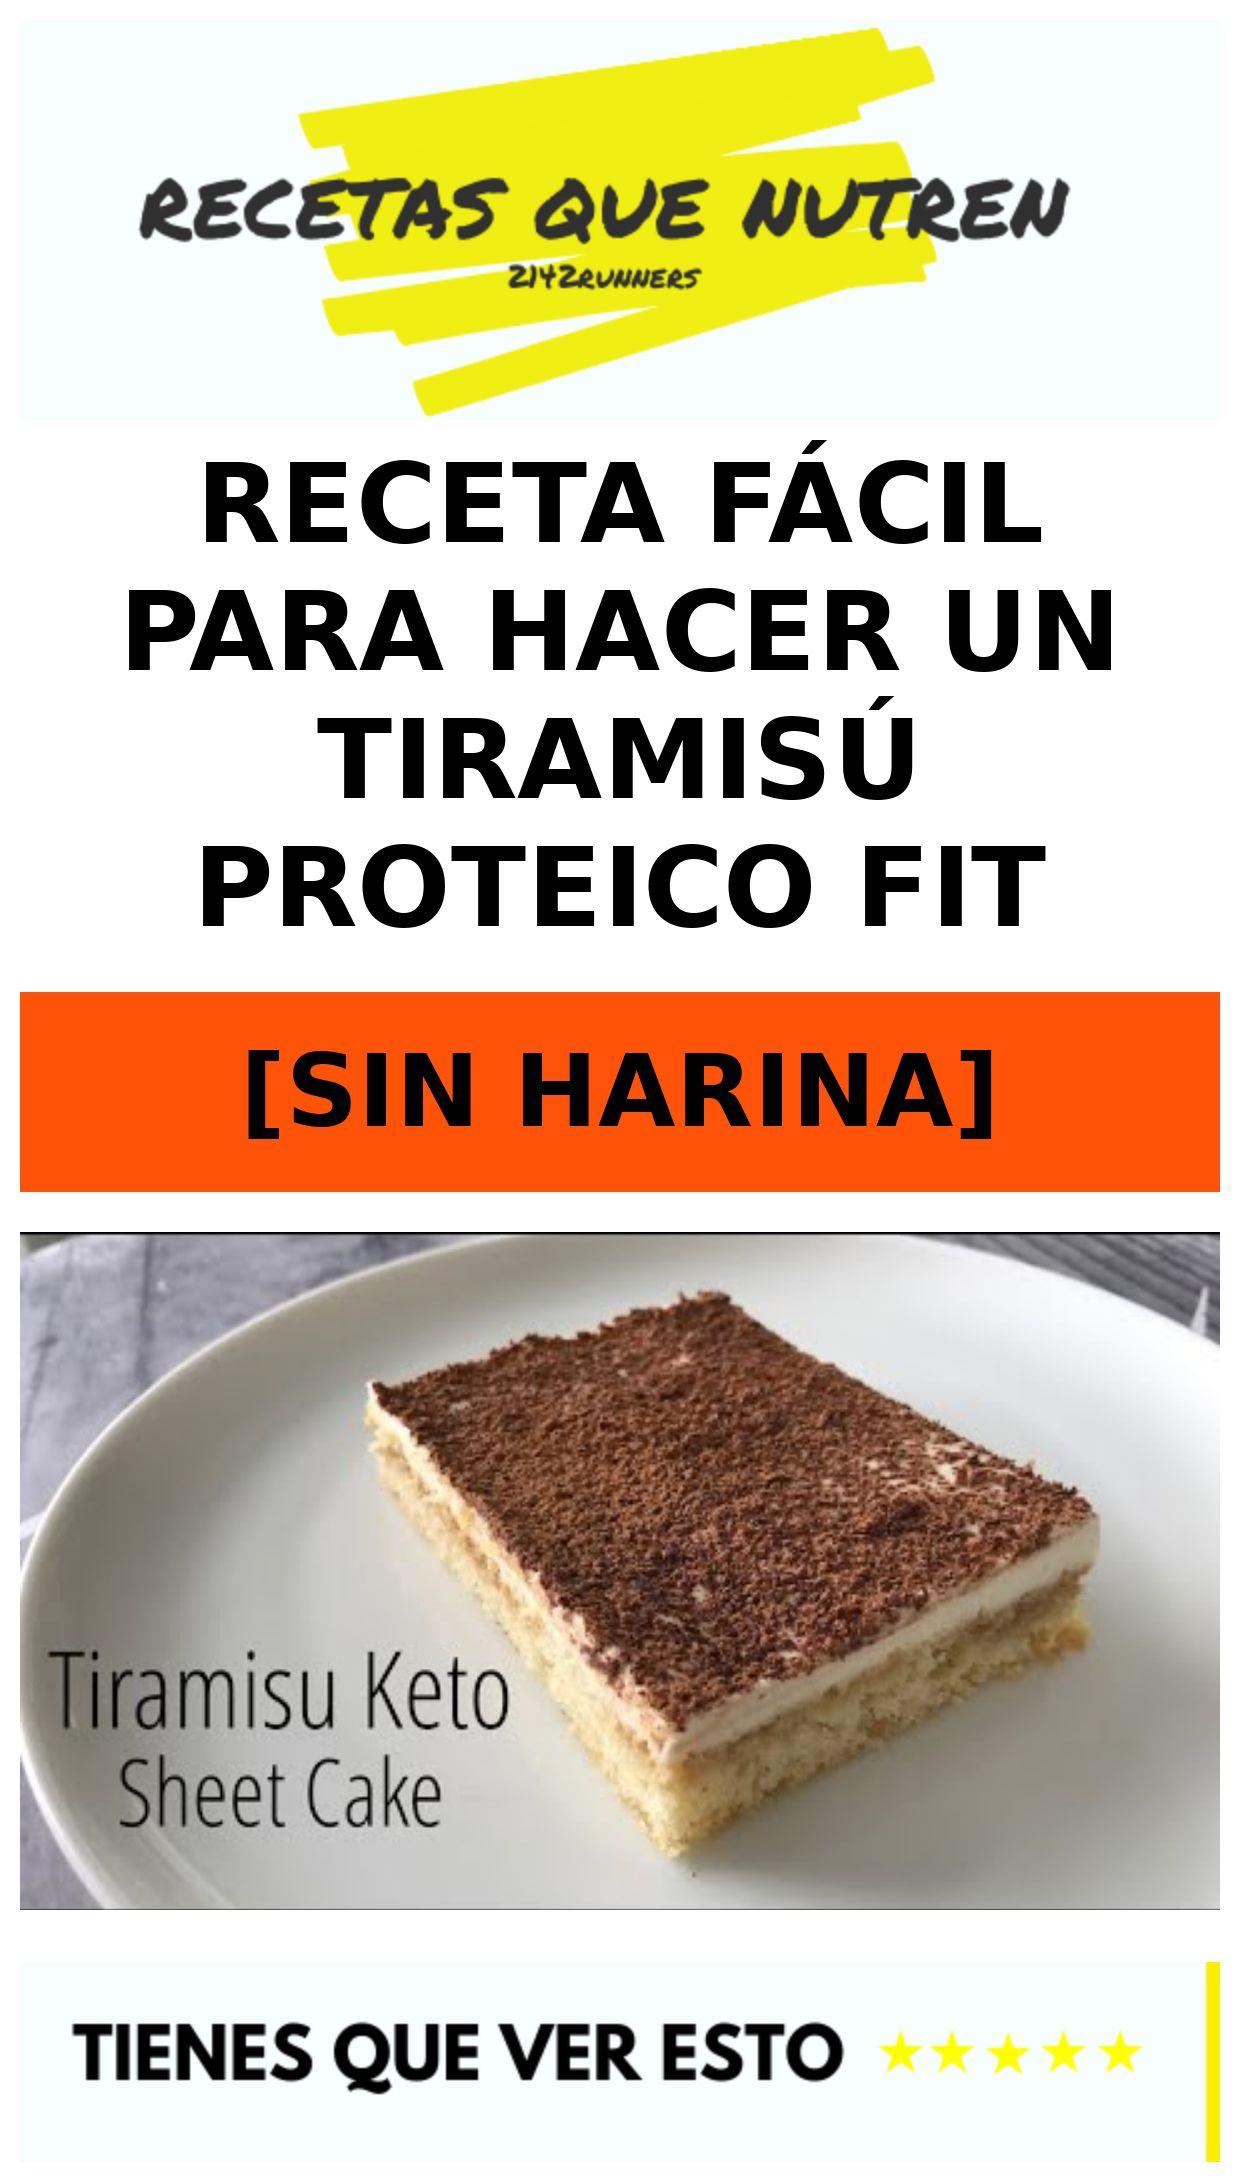 Receta fácil para hacer un TIRAMISÚ proteico fit